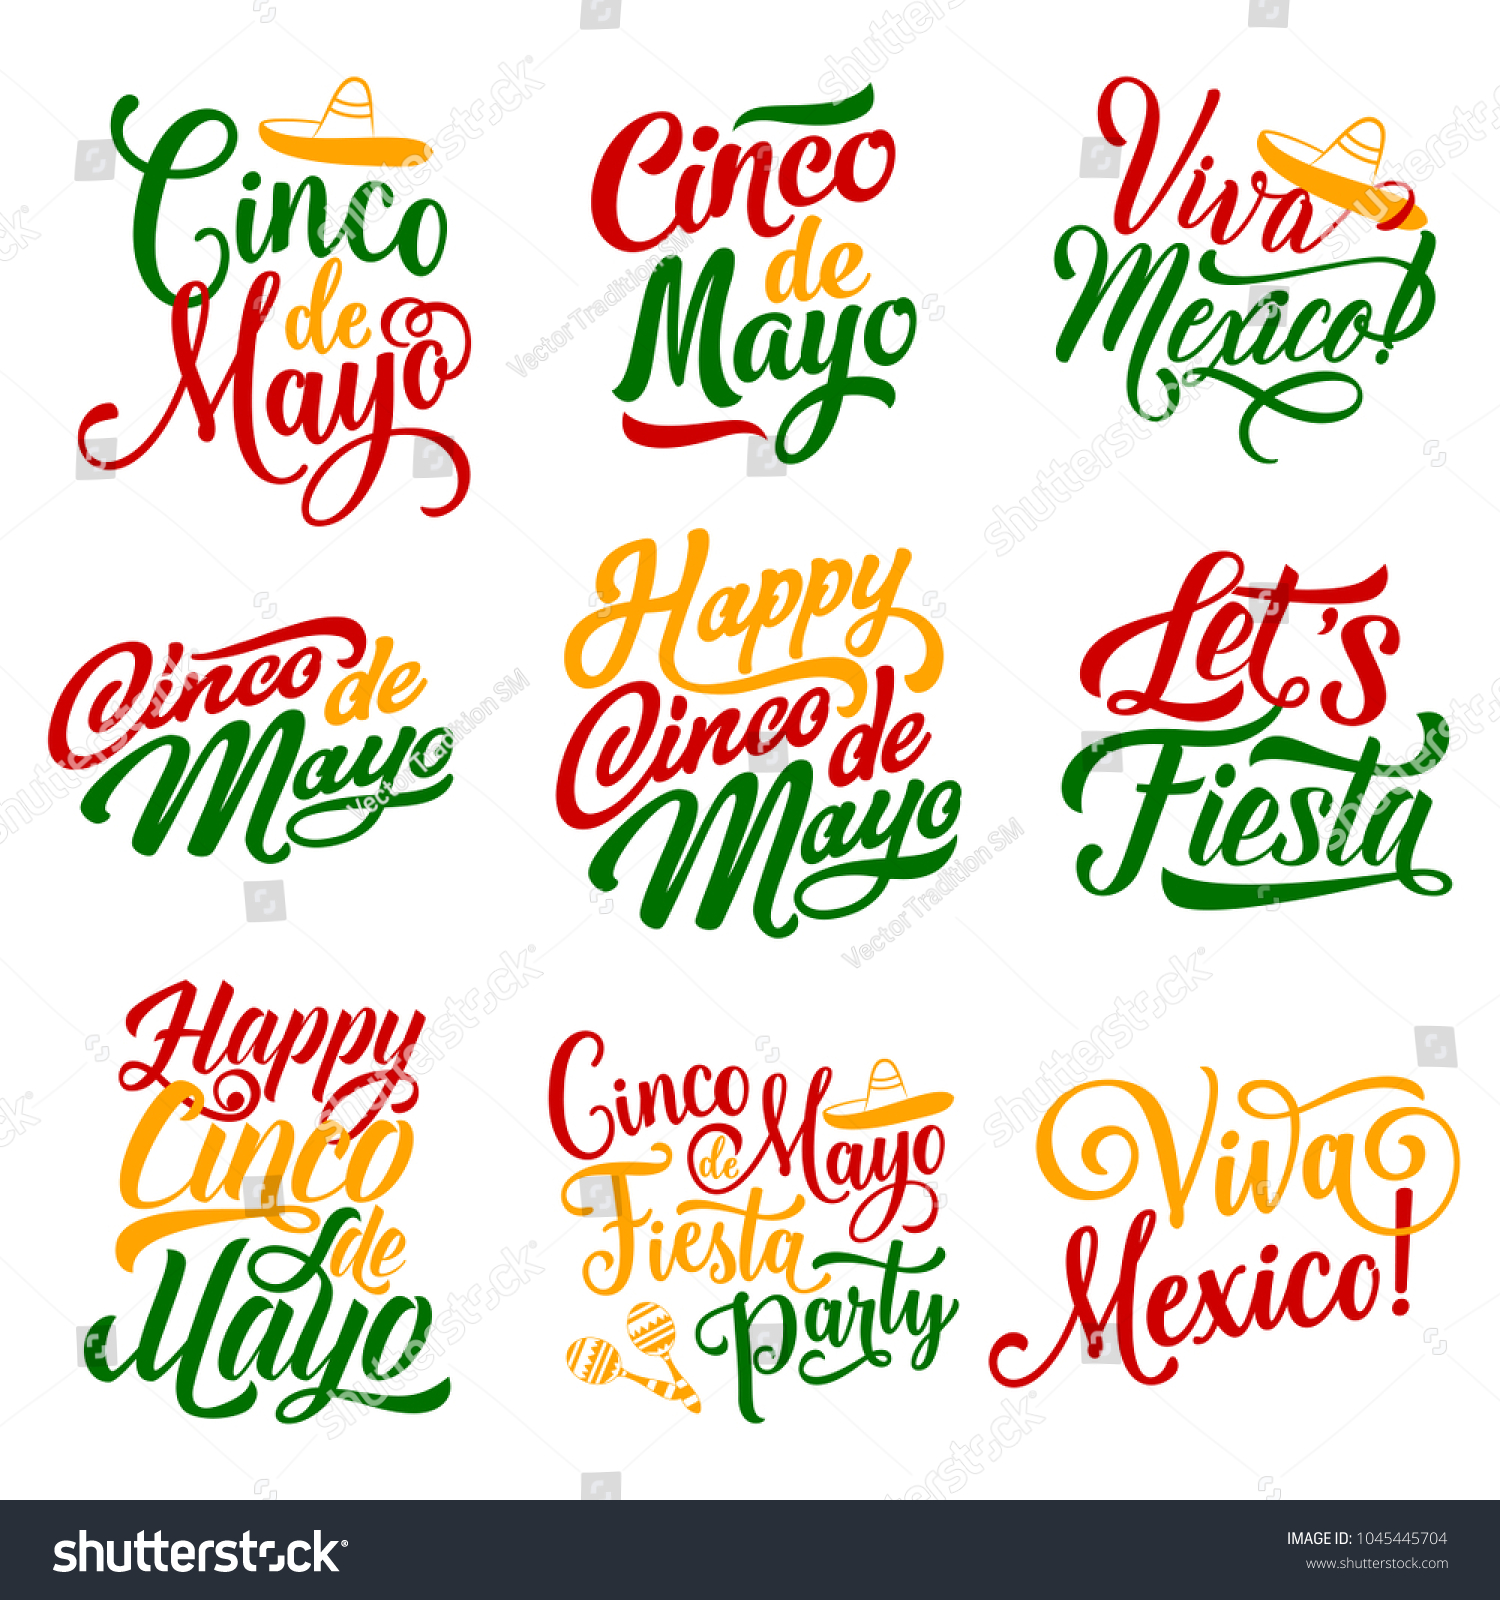 Cinco De Mayo Mexican Holiday Party Stock Vector Royalty Free